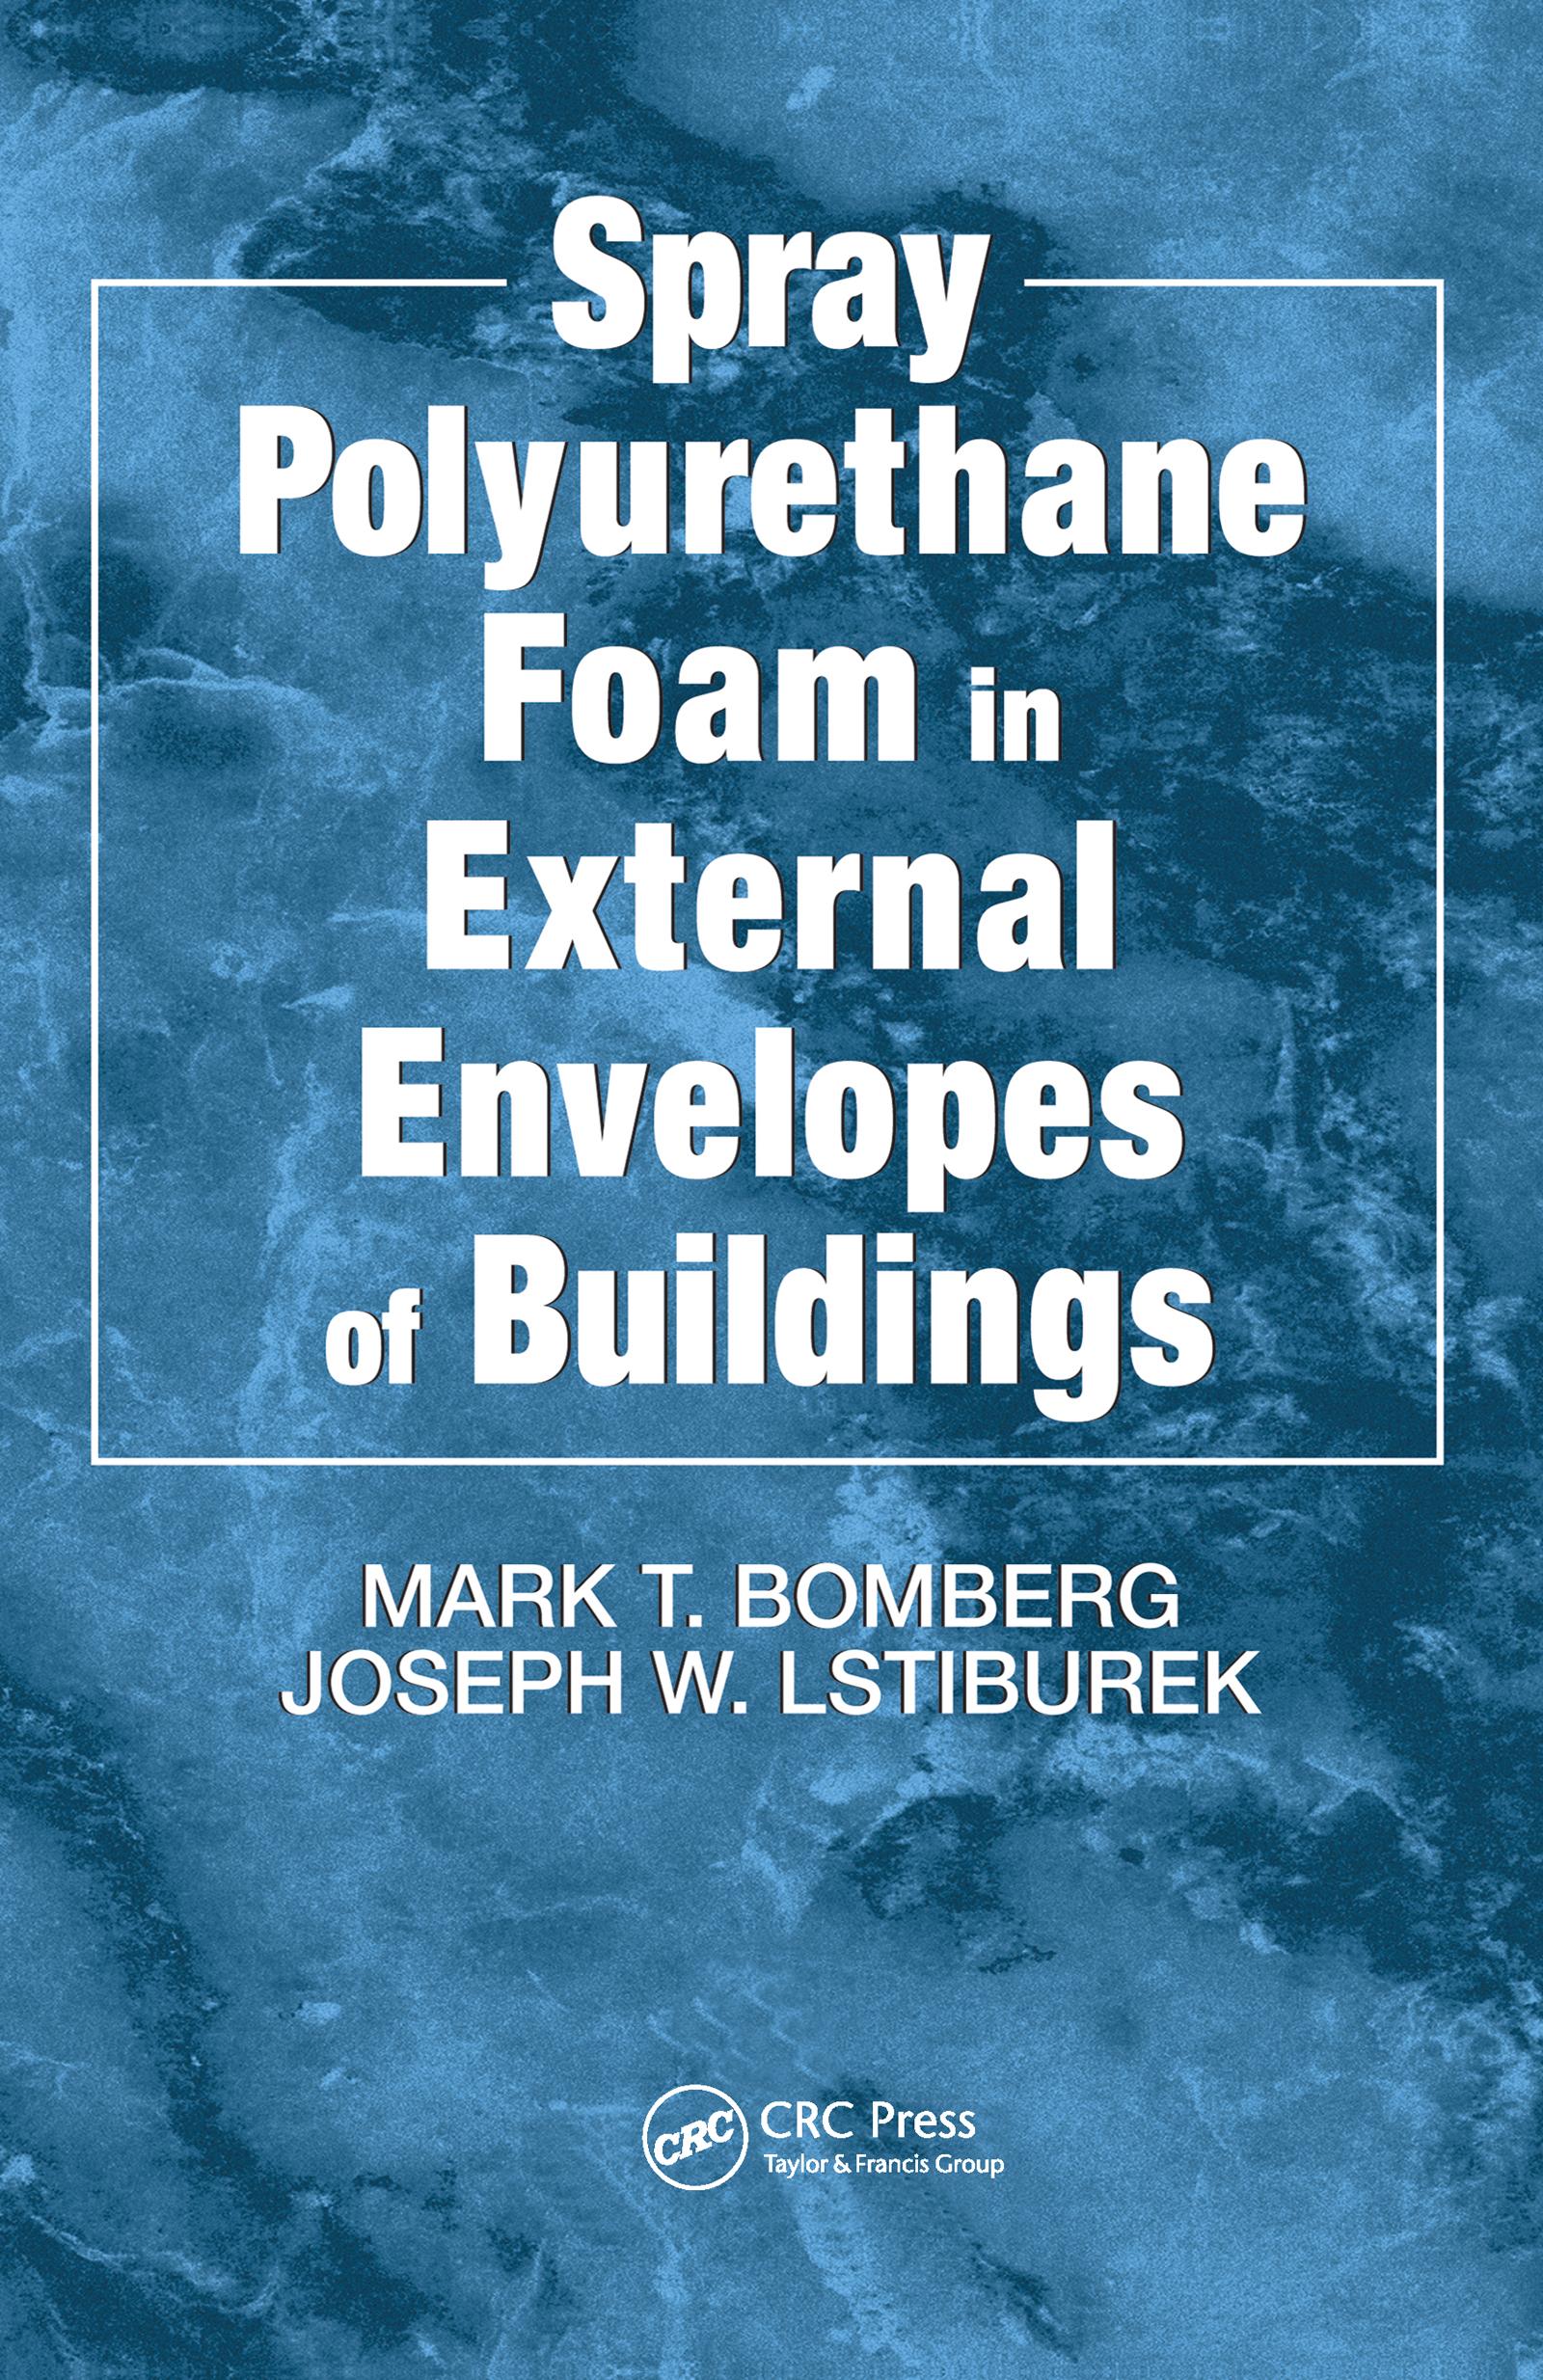 Spray Polyurethane Foam in External Envelopes of Buildings